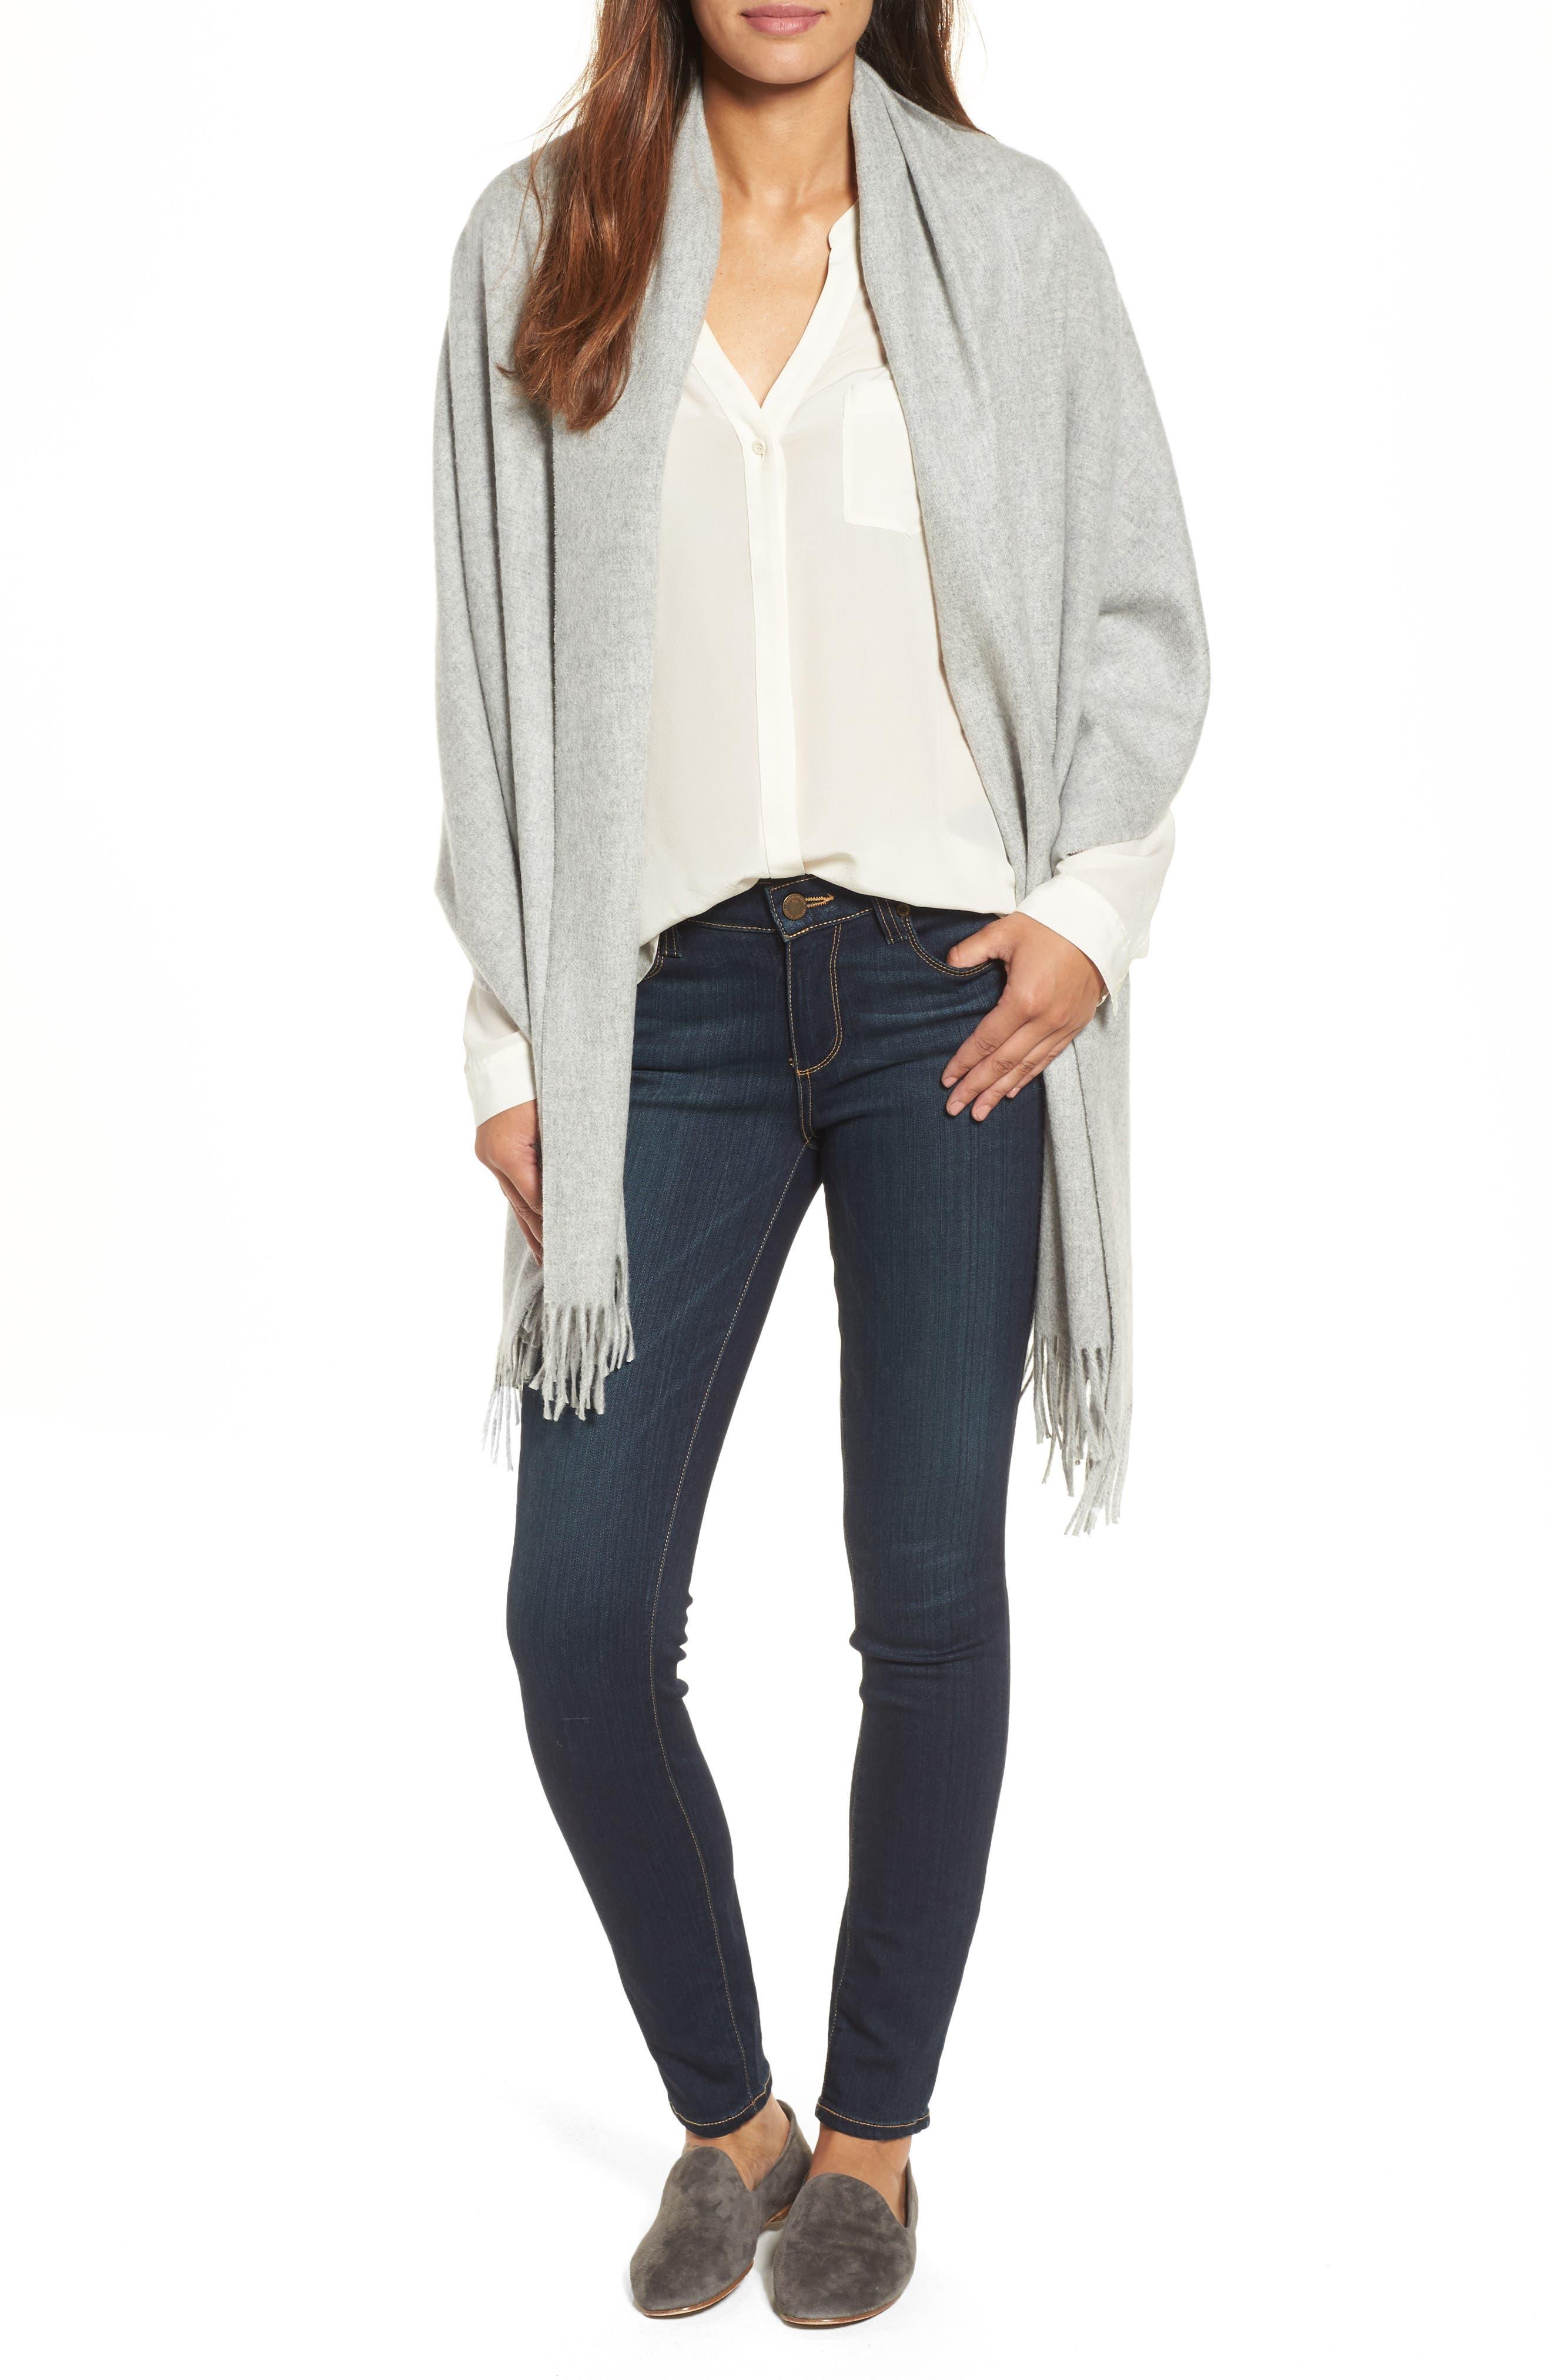 Oversize Cashmere Wrap,                         Main,                         color, Grey Soft Heather